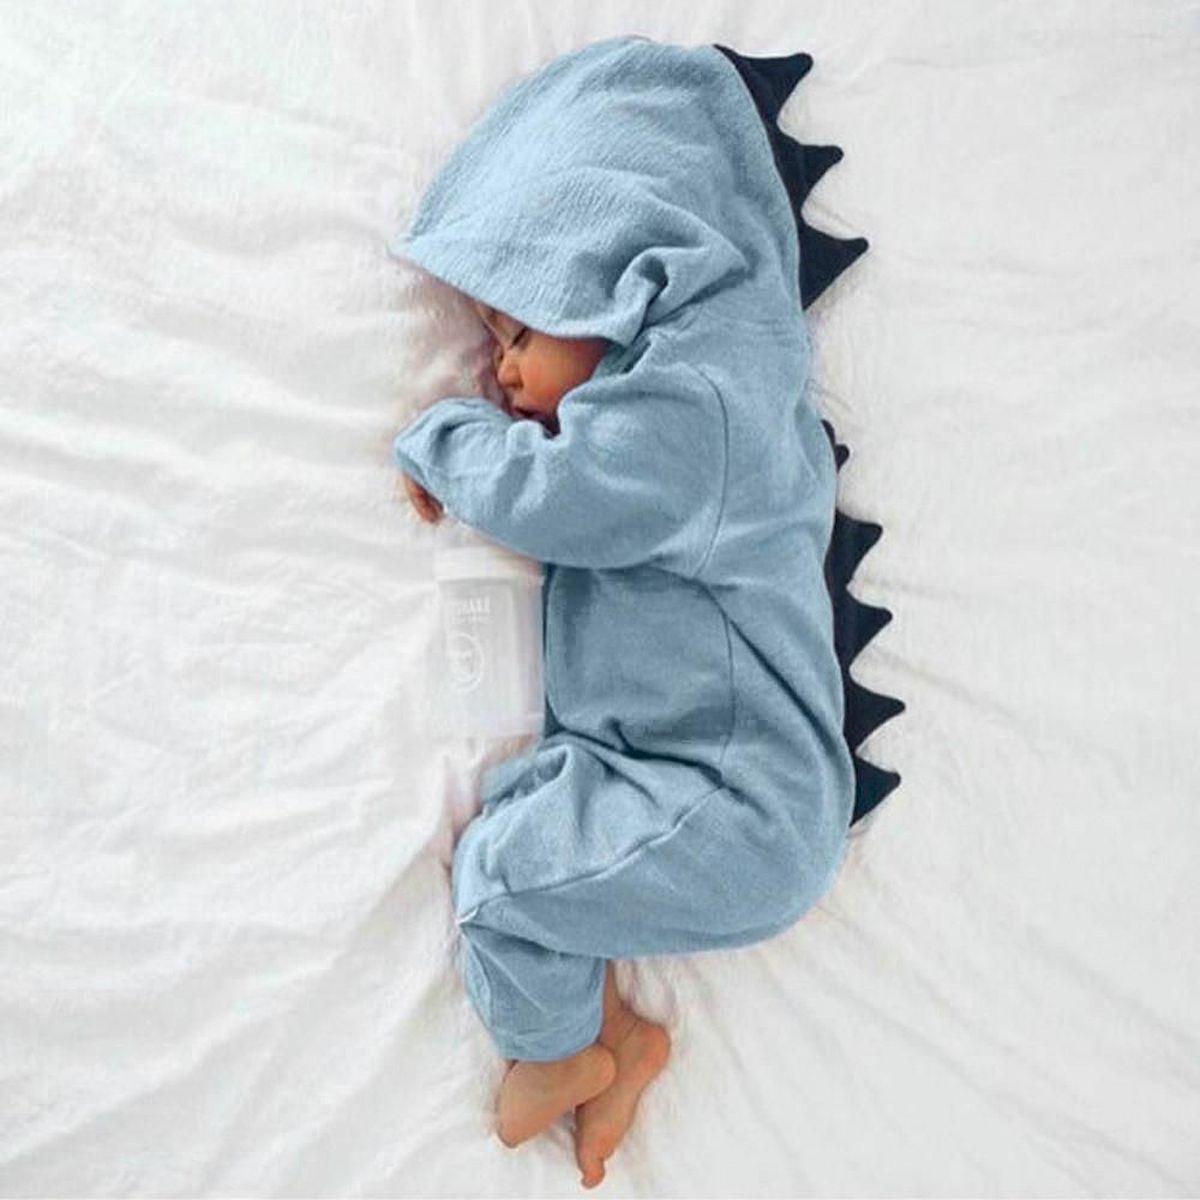 69d038d429824 Adorable 55 Cool Newborn Baby Boy Clothes source : https://rontsen.com